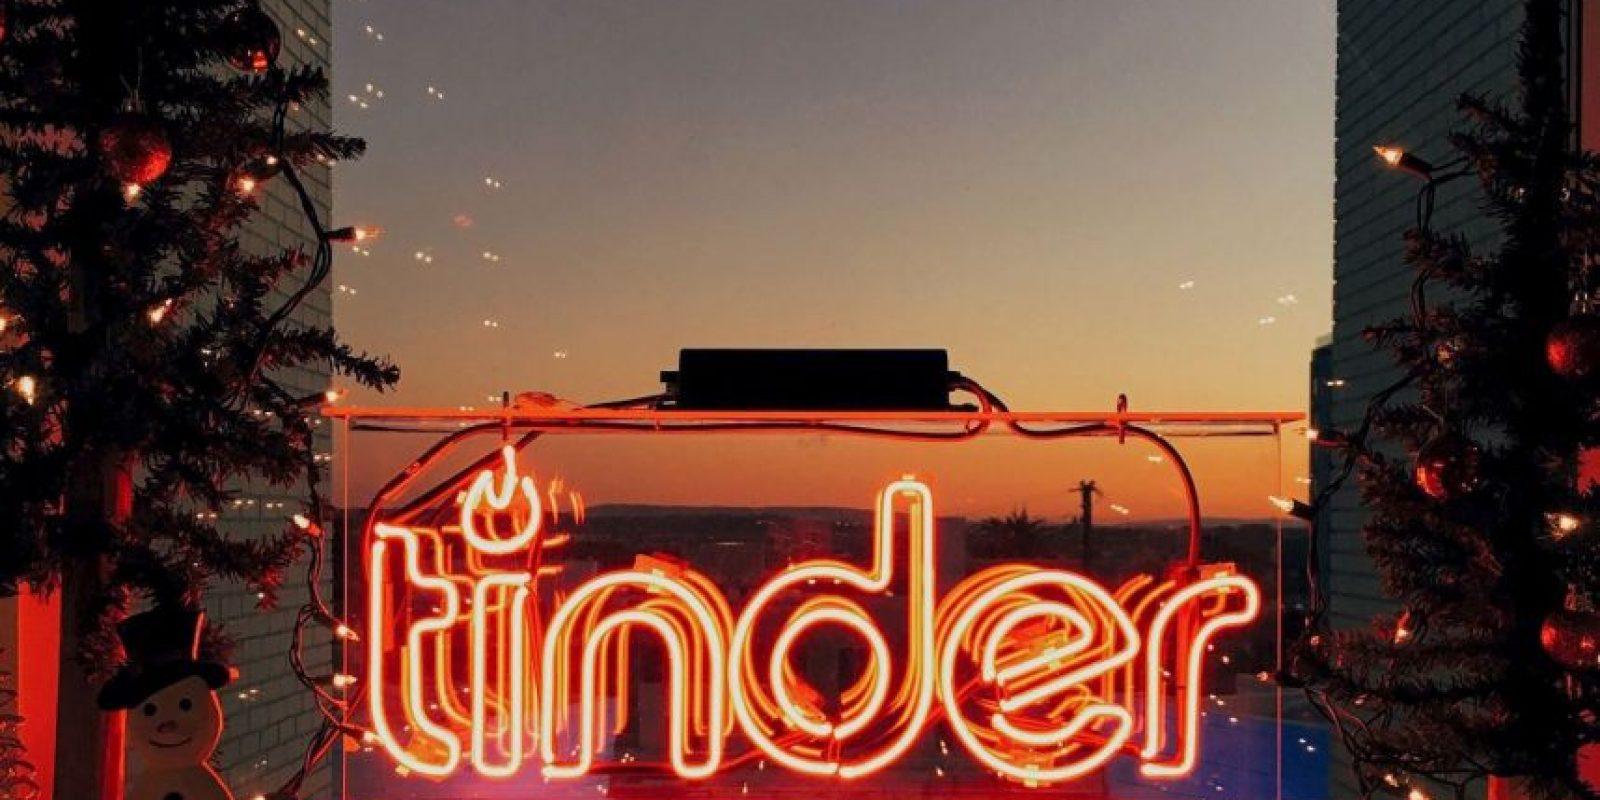 2. Empresario Foto:Facebook.com/tinder